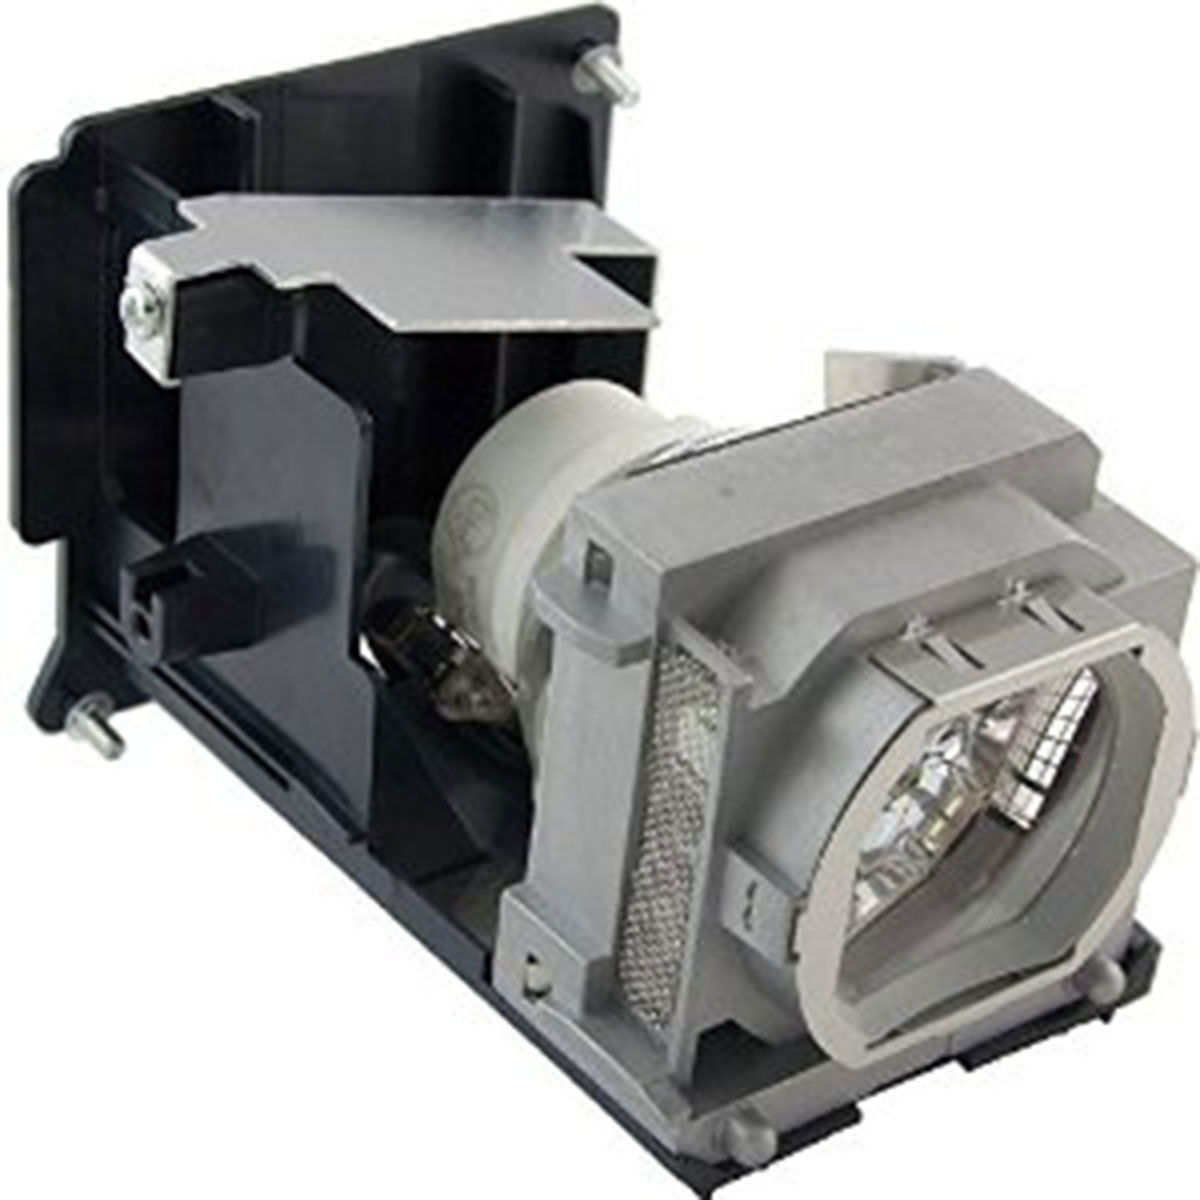 VLT-HC6800LP HC6800LP VLTHC6800LP Lamp for Mitsubishi HC6800 HC6800U Projector Lamp Bulb with housing<br><br>Aliexpress